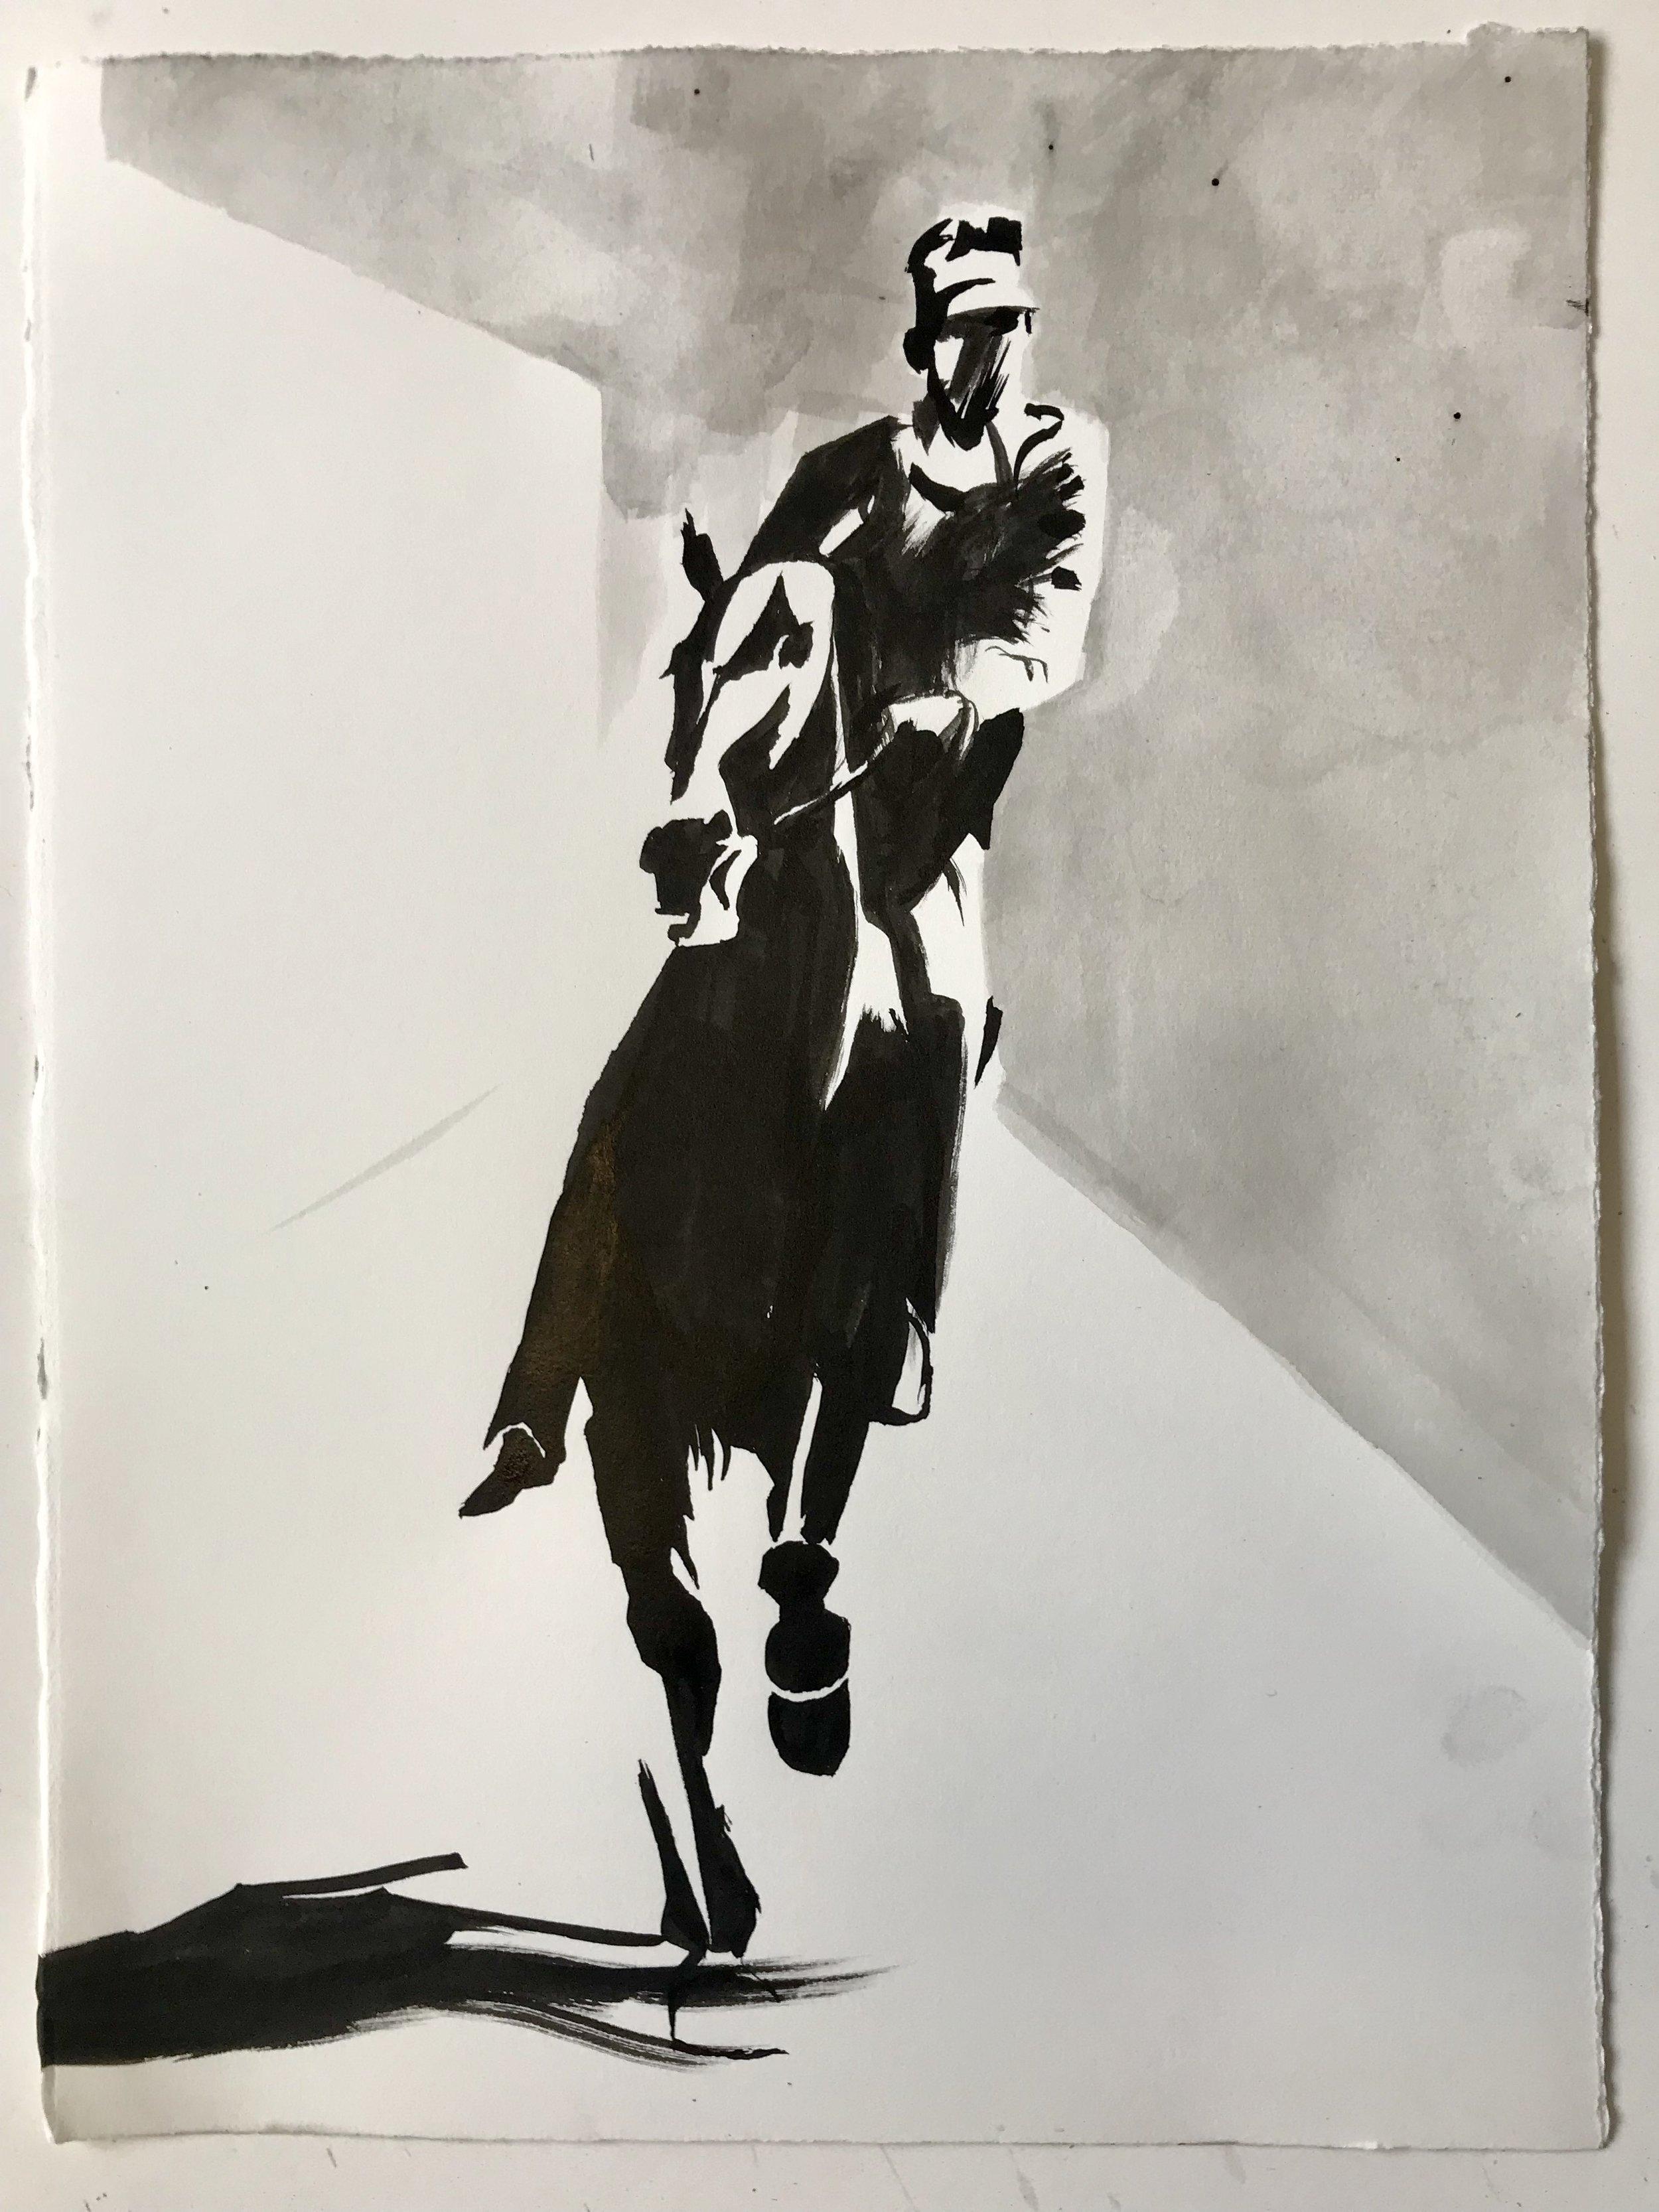 Horse, Rider